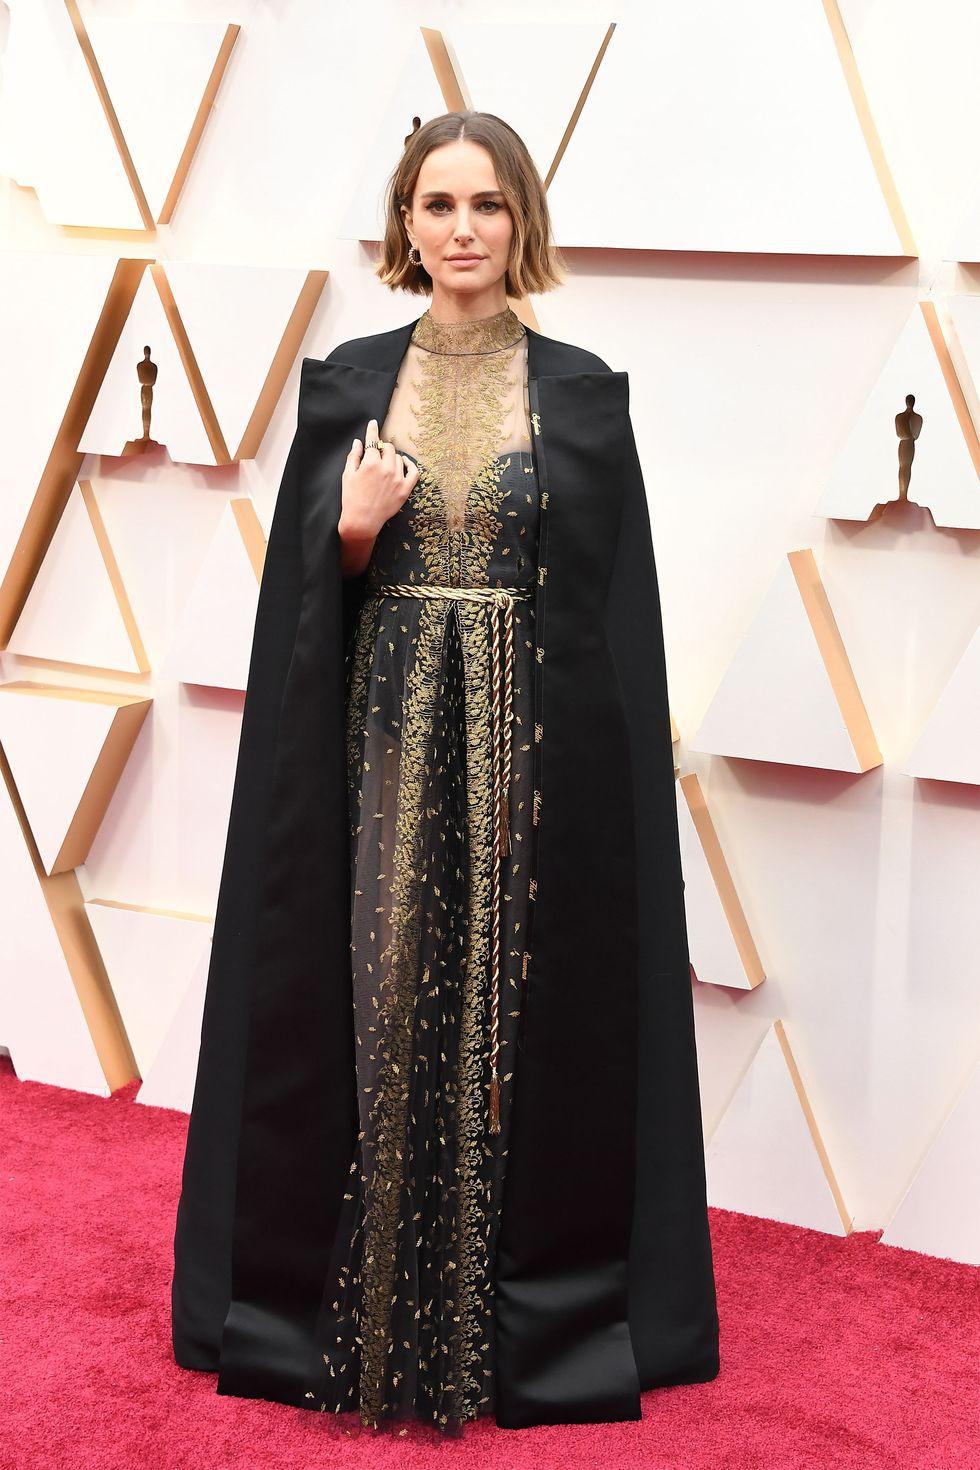 Natalie Portman bob καστανο καρε ολοσωμη